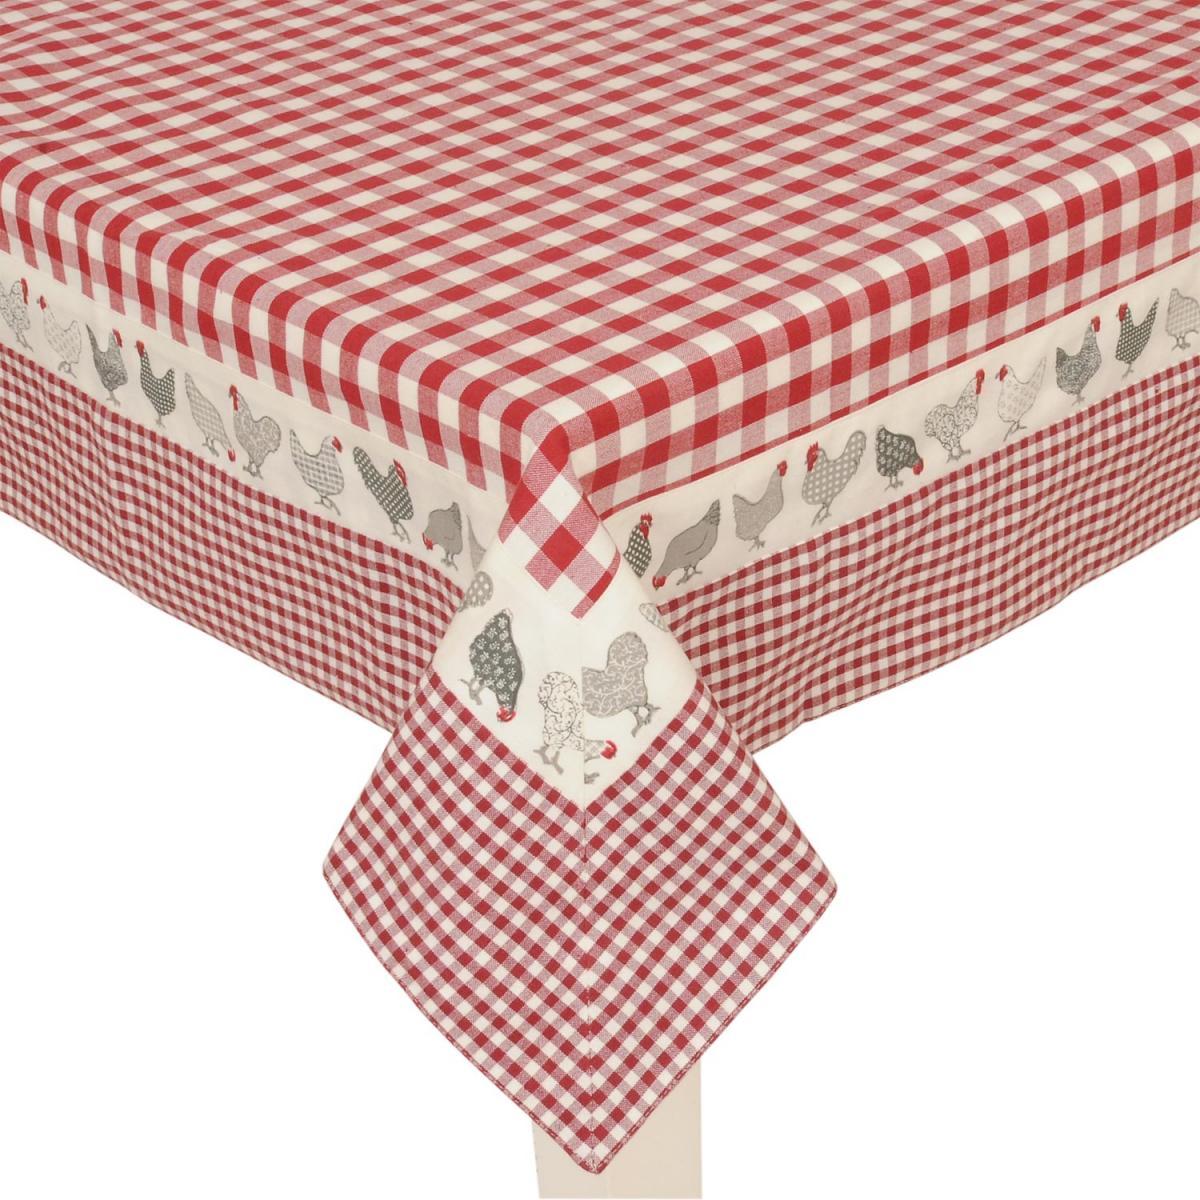 clayre eef cao05r tischdecke rot h hner 150 250cm. Black Bedroom Furniture Sets. Home Design Ideas